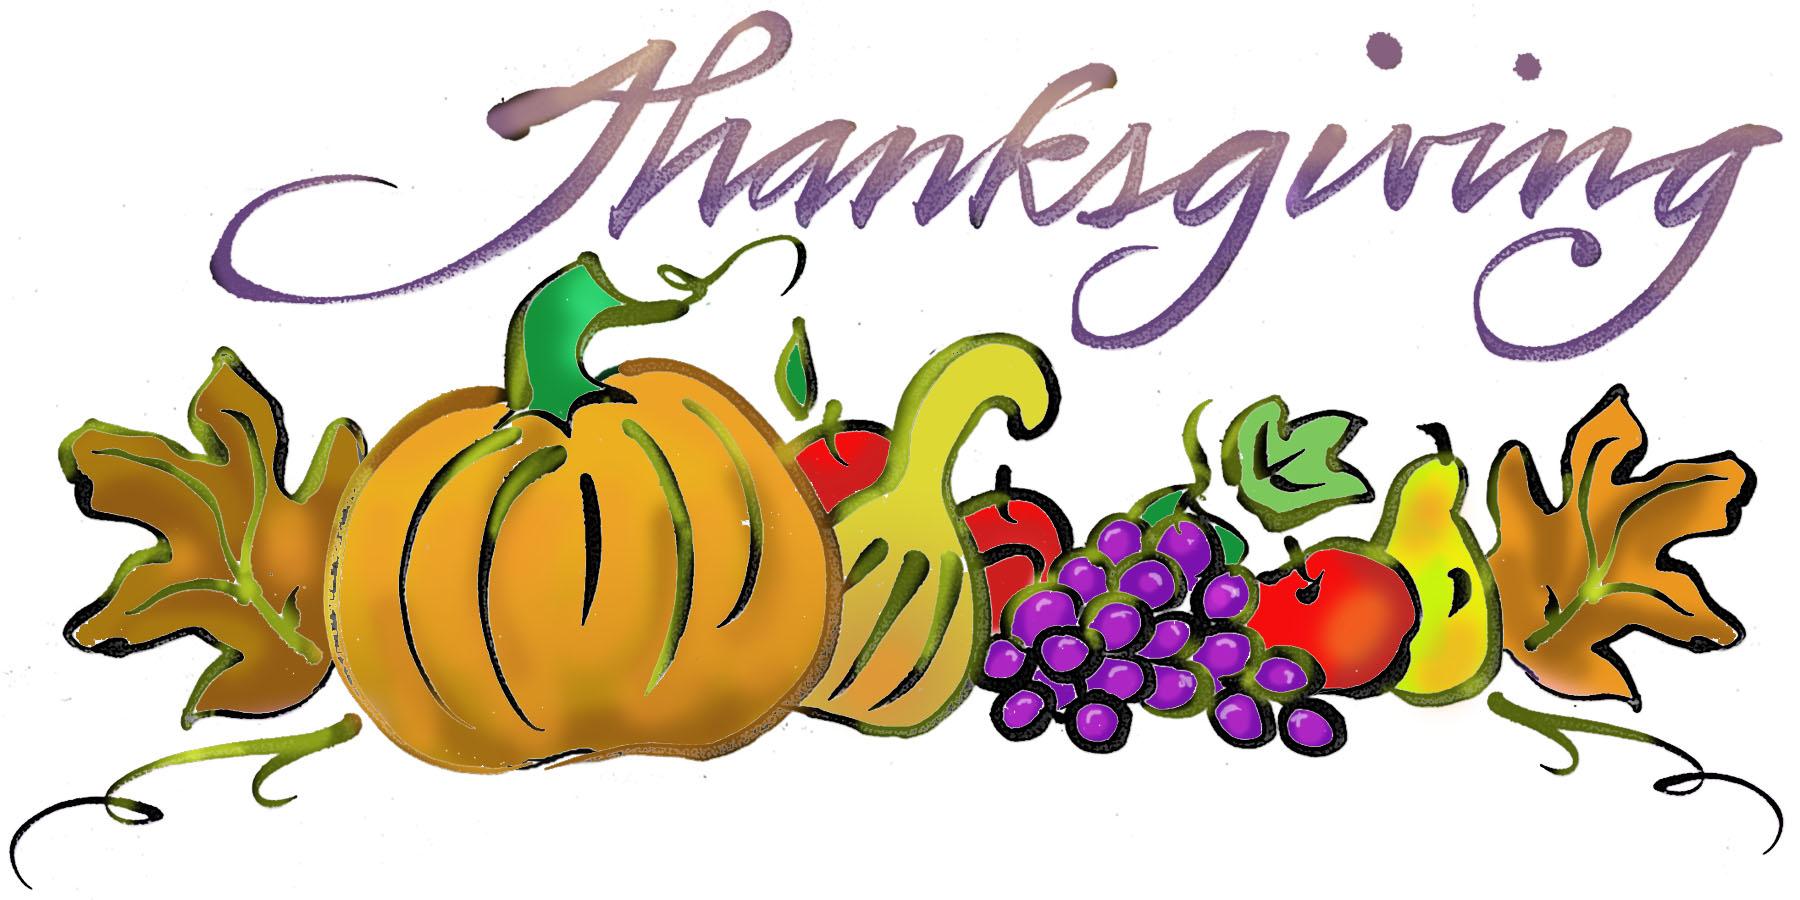 Thankgiving dinner clipart clipart vector Church thanksgiving dinner clipart - ClipartFest vector